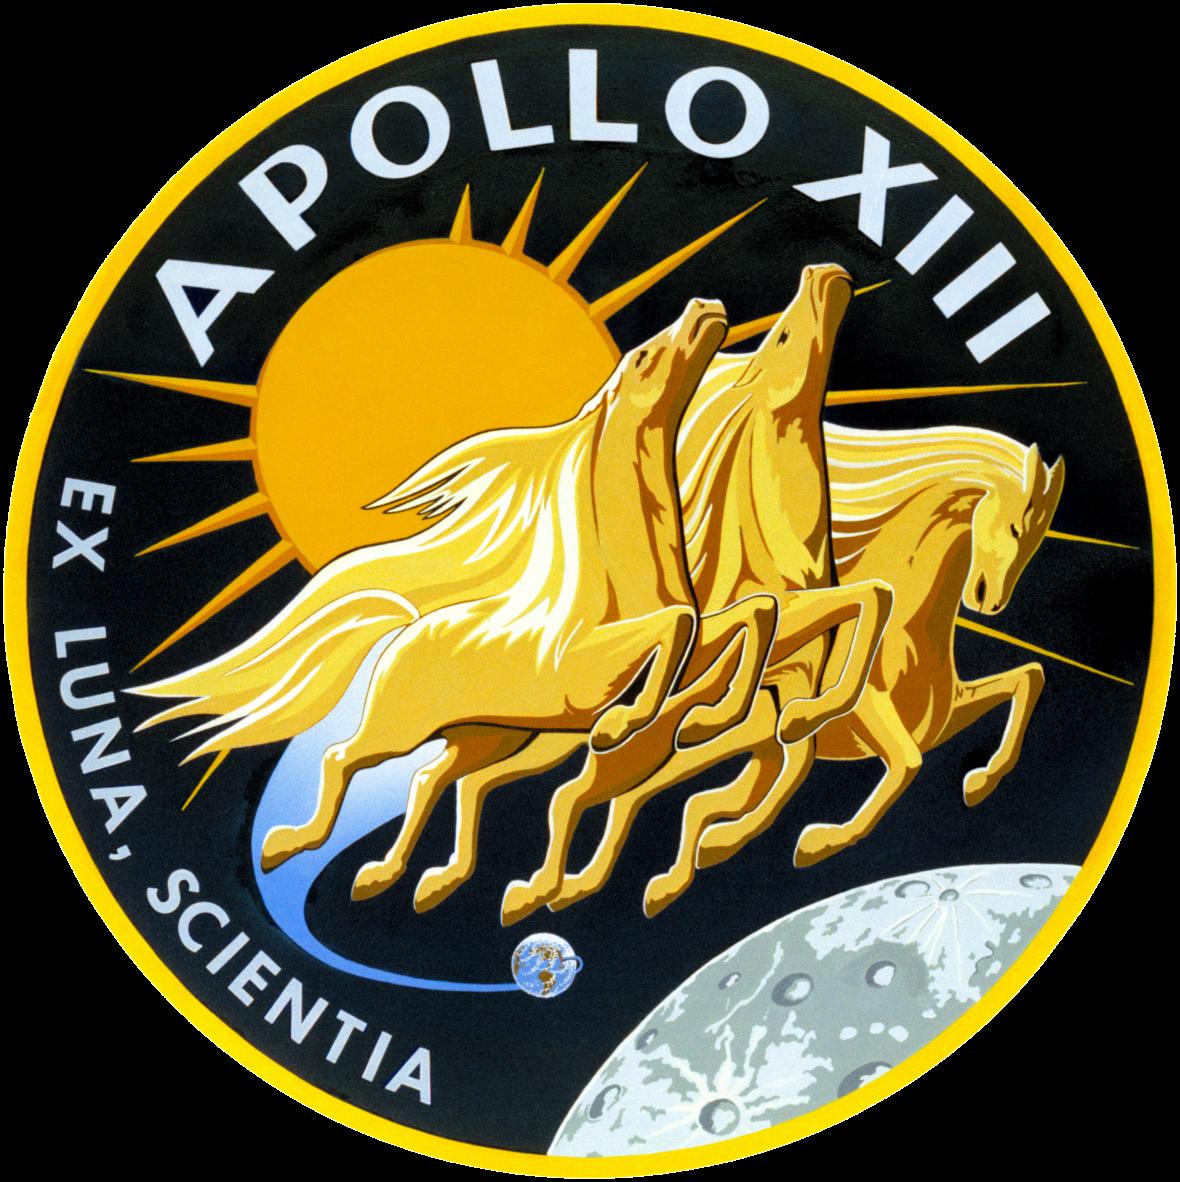 Insignie Apolla 13